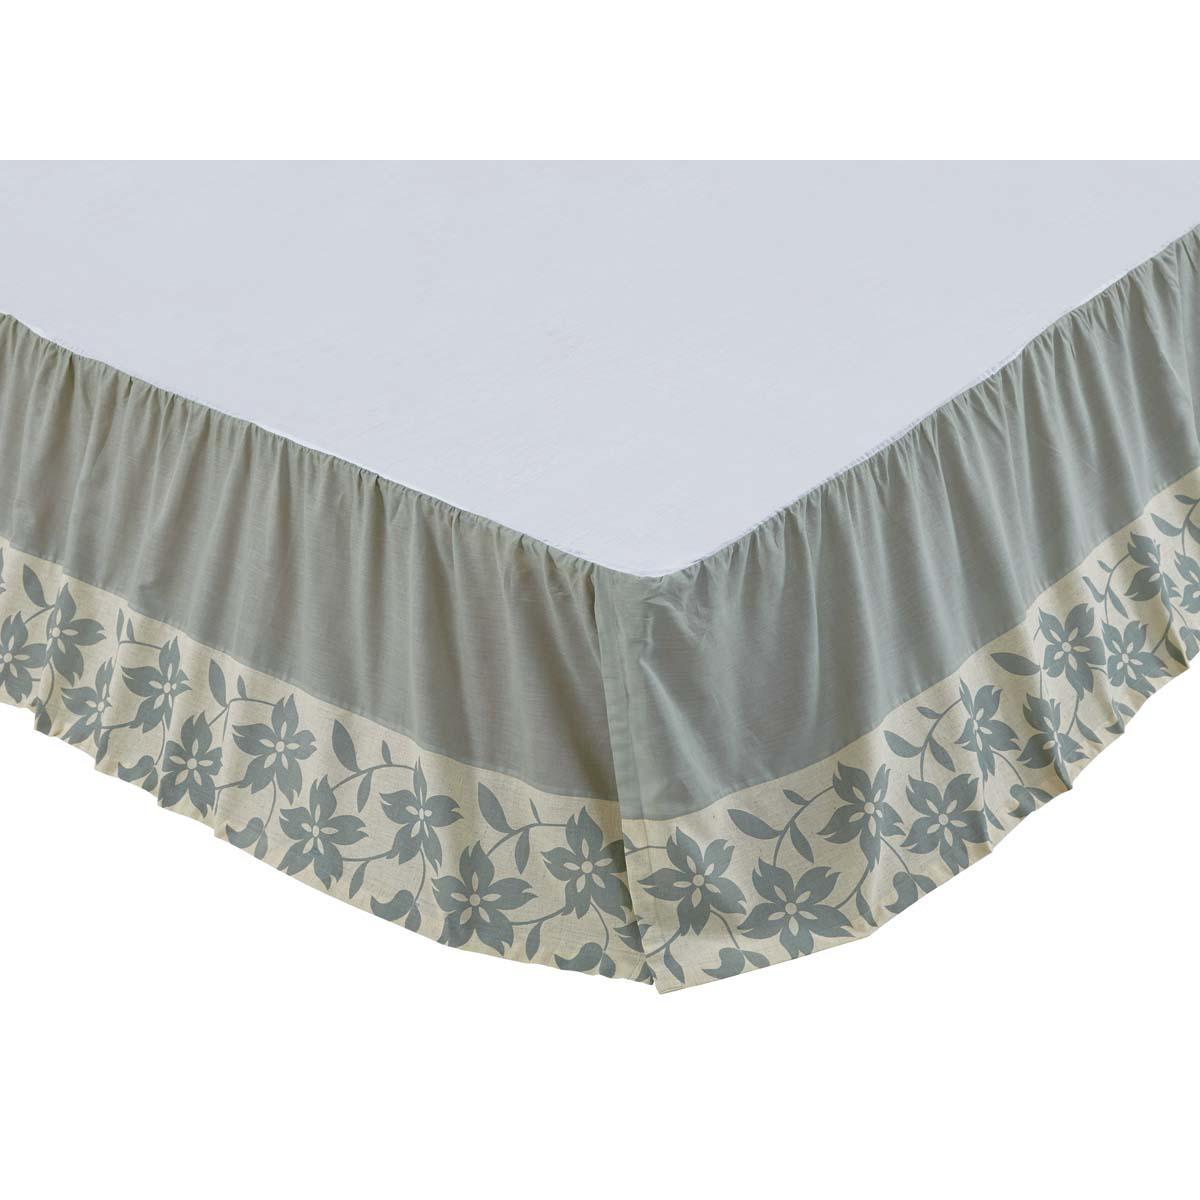 Briar Sage Queen Bed Skirt 60x80x16